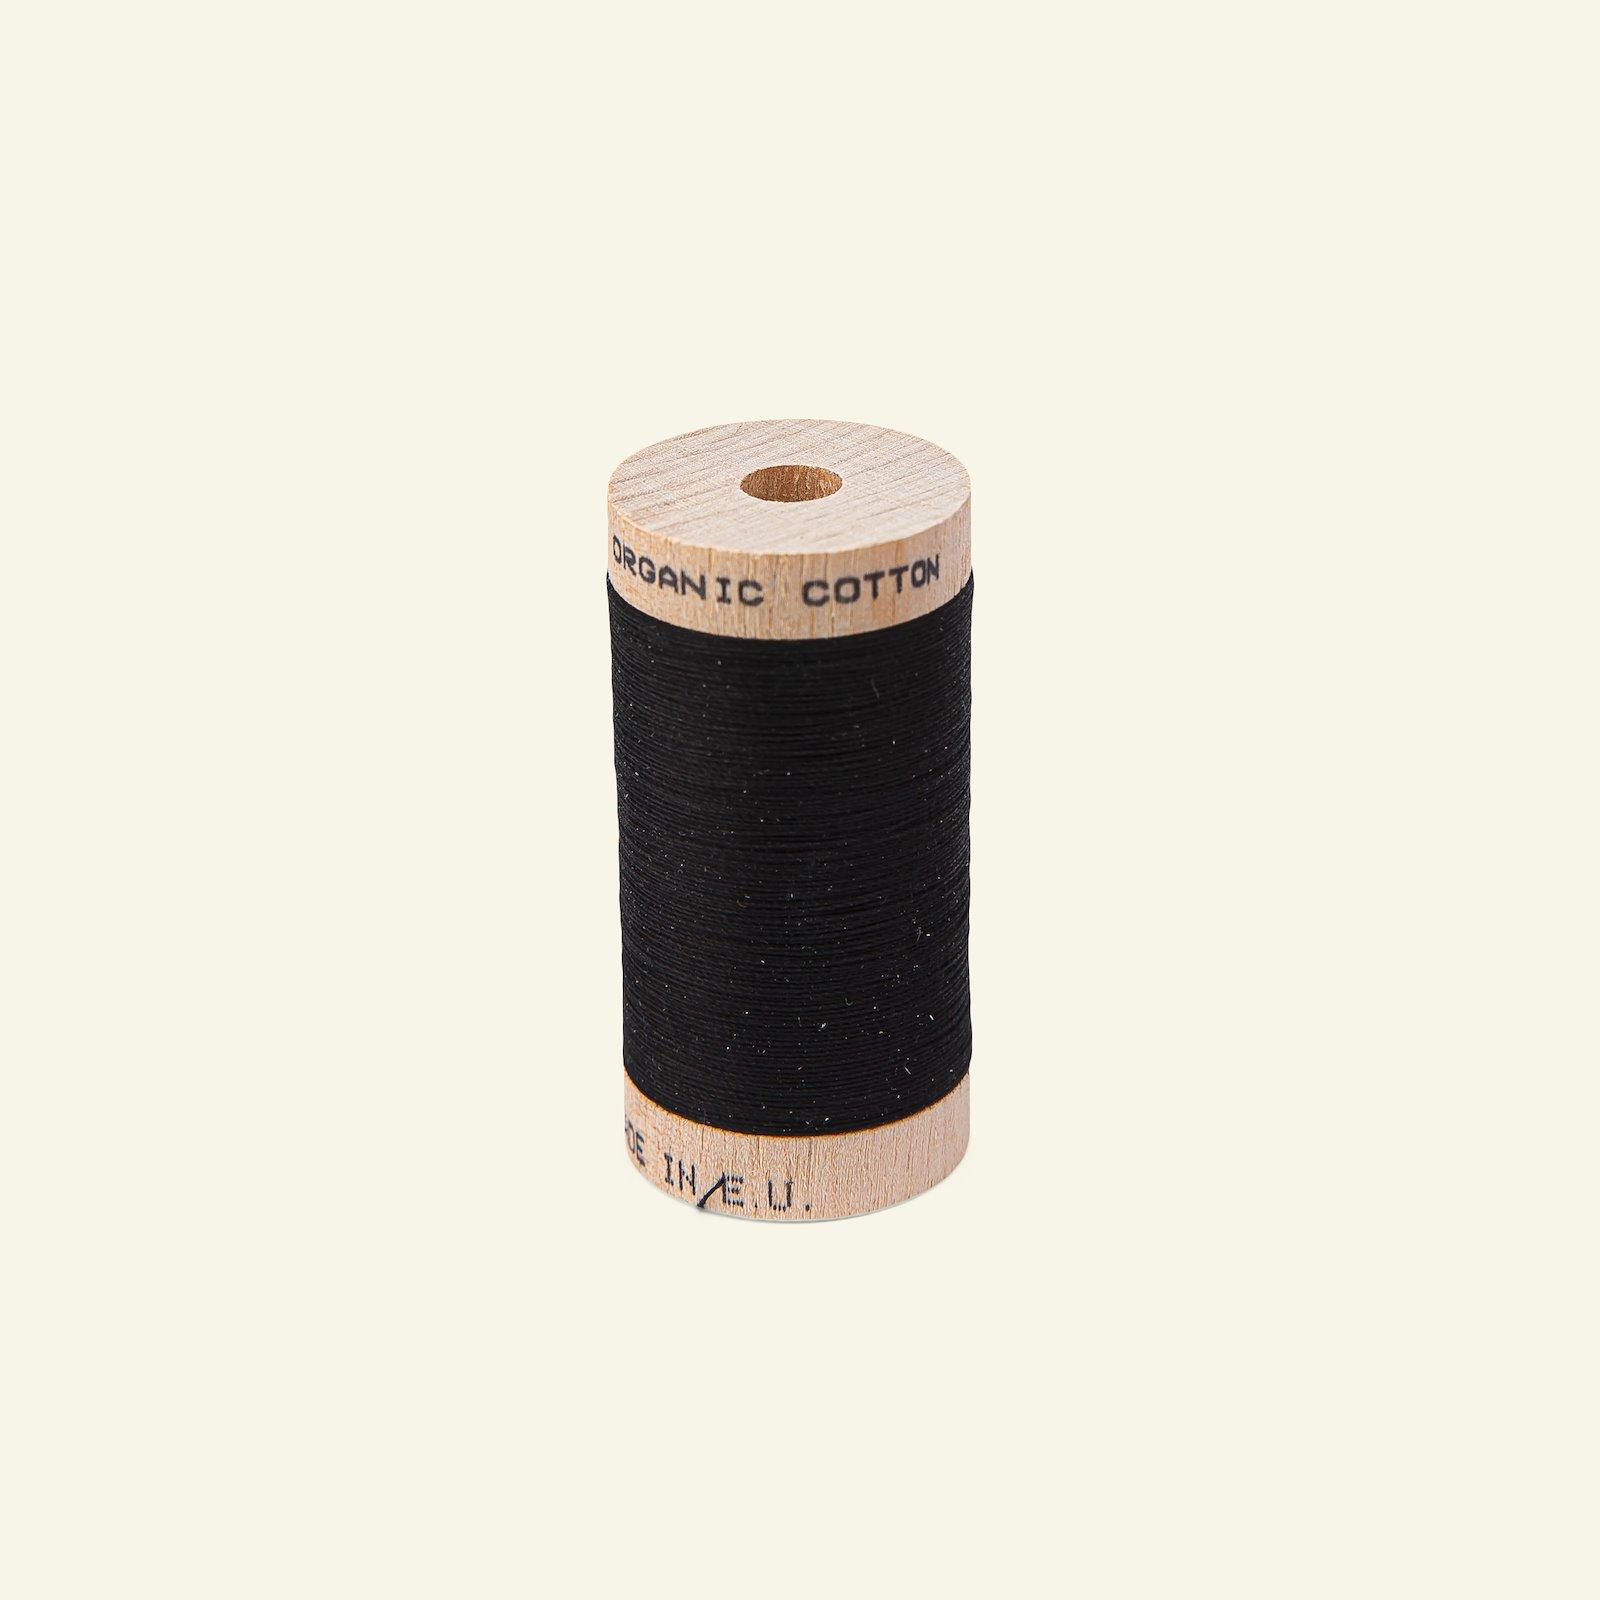 Sewing thread organic cotton black 100m 18043_pack